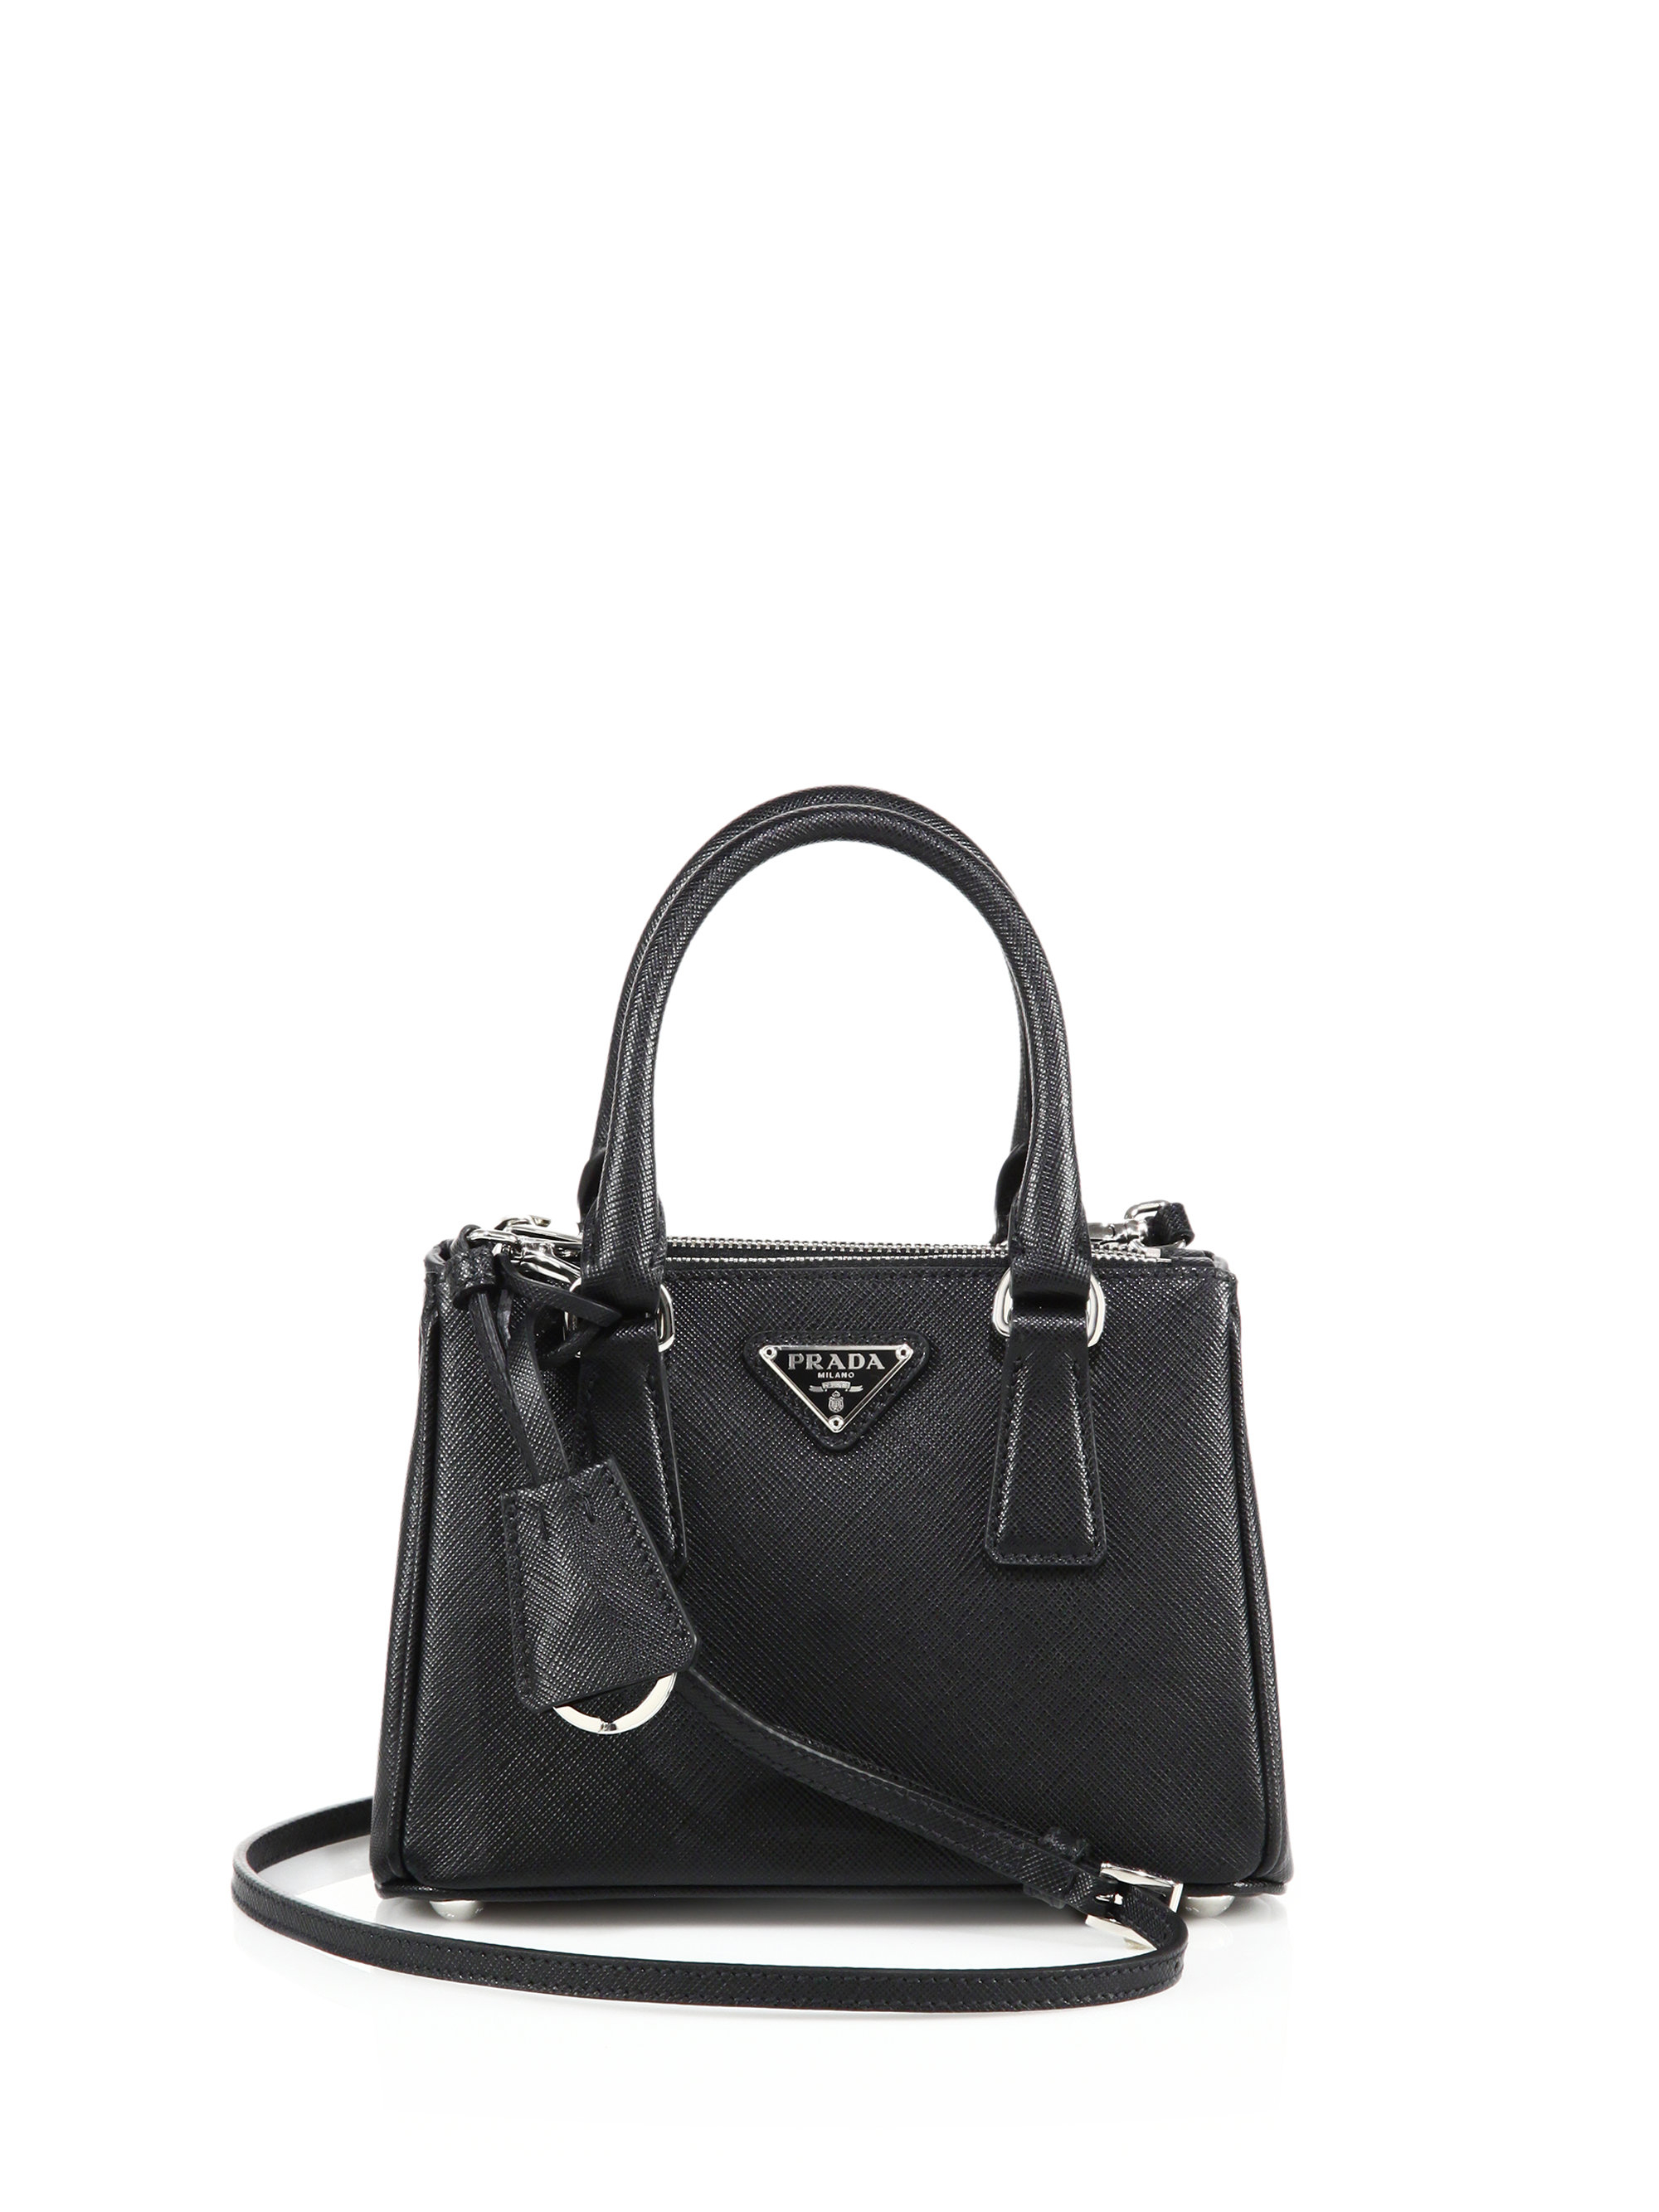 handbag prada - prada mini saffiano leather double-zip tote, authentic pradas for ...